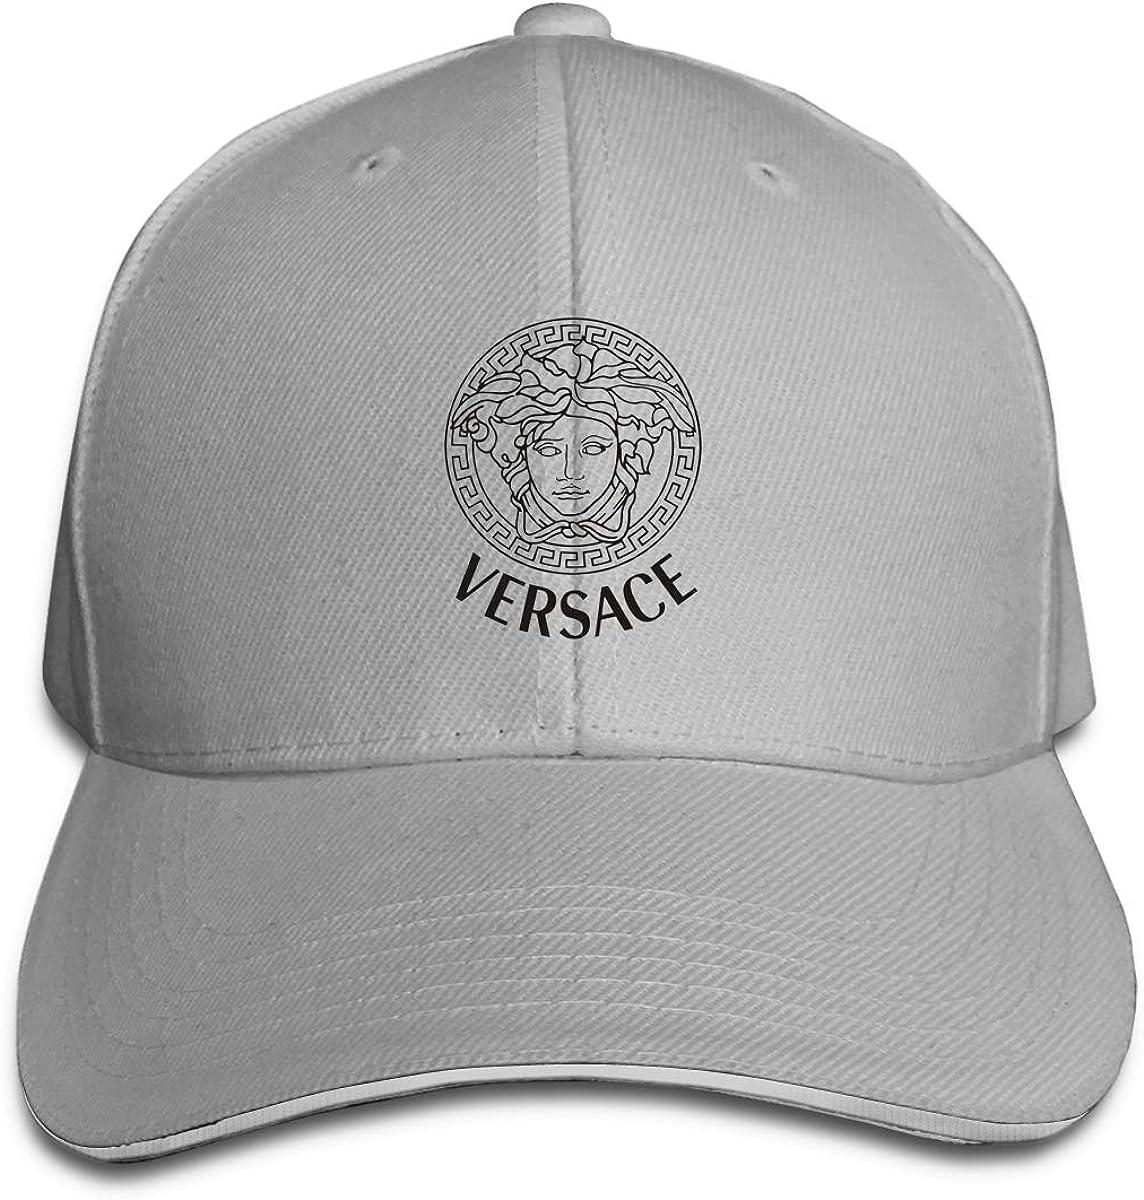 QQ图片20190312133830 Classic Adjustable Cotton Baseball Caps Trucker Driver Hat Outdoor Cap Gray